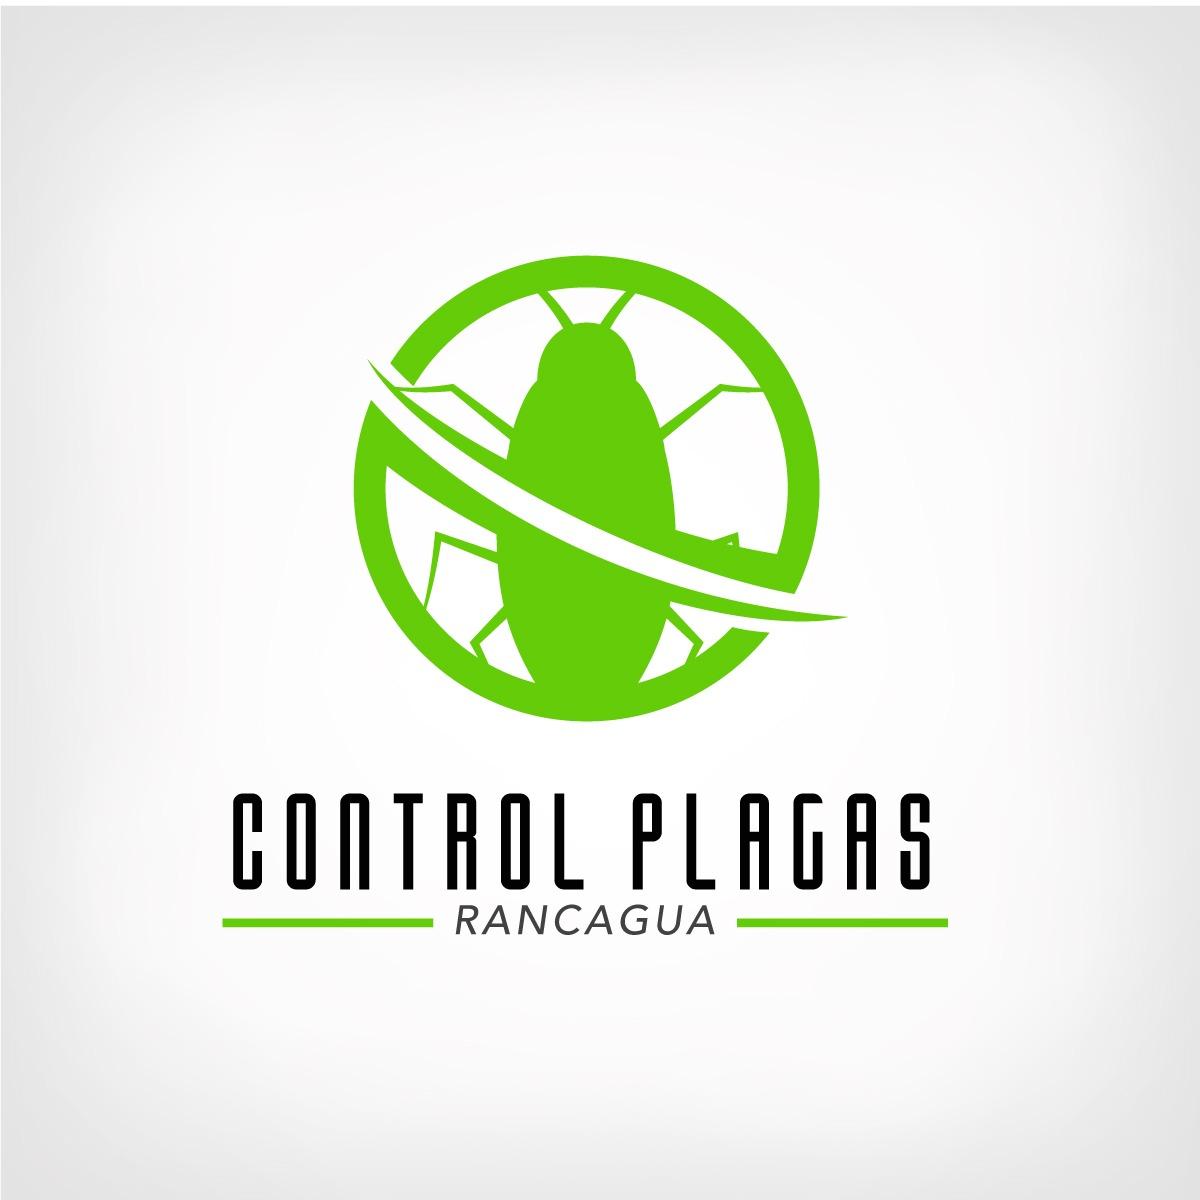 Control Plagas Rancagua